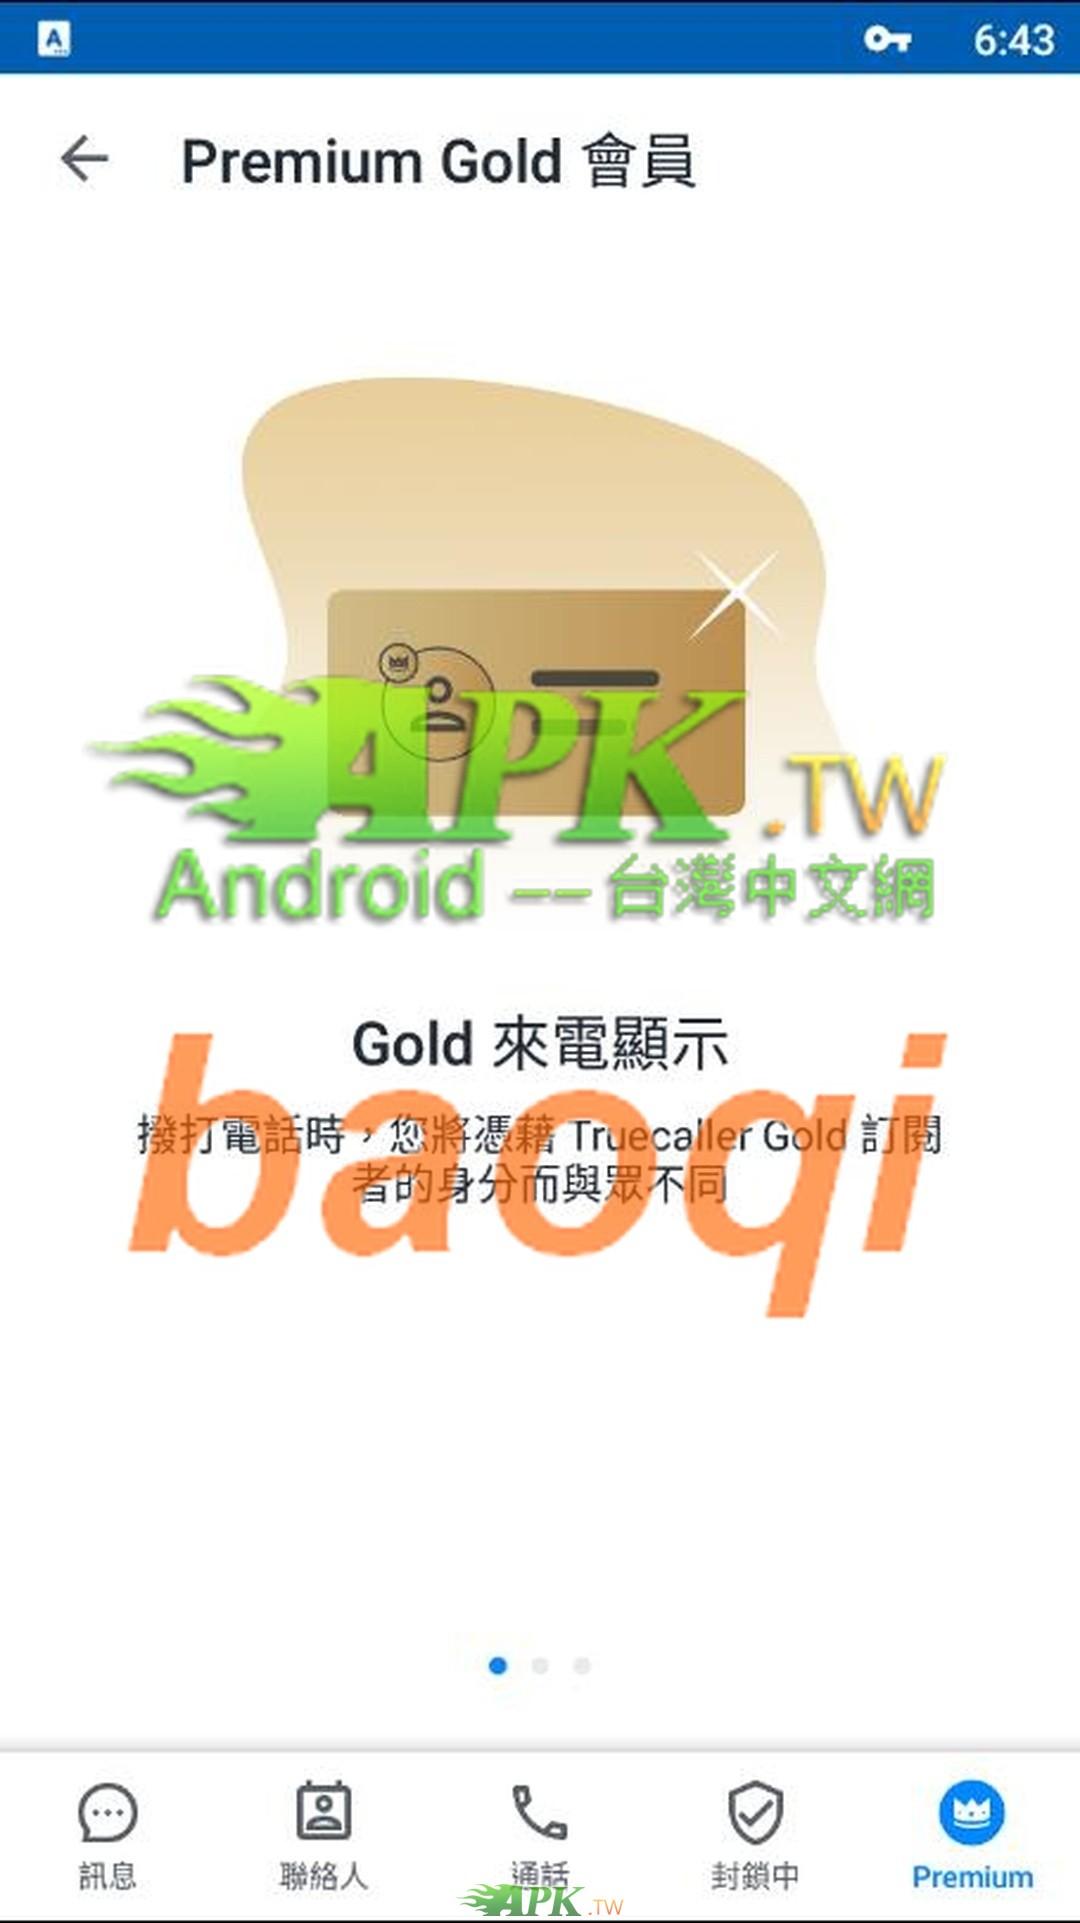 Truecaller_Premium_3_Gold_.jpg